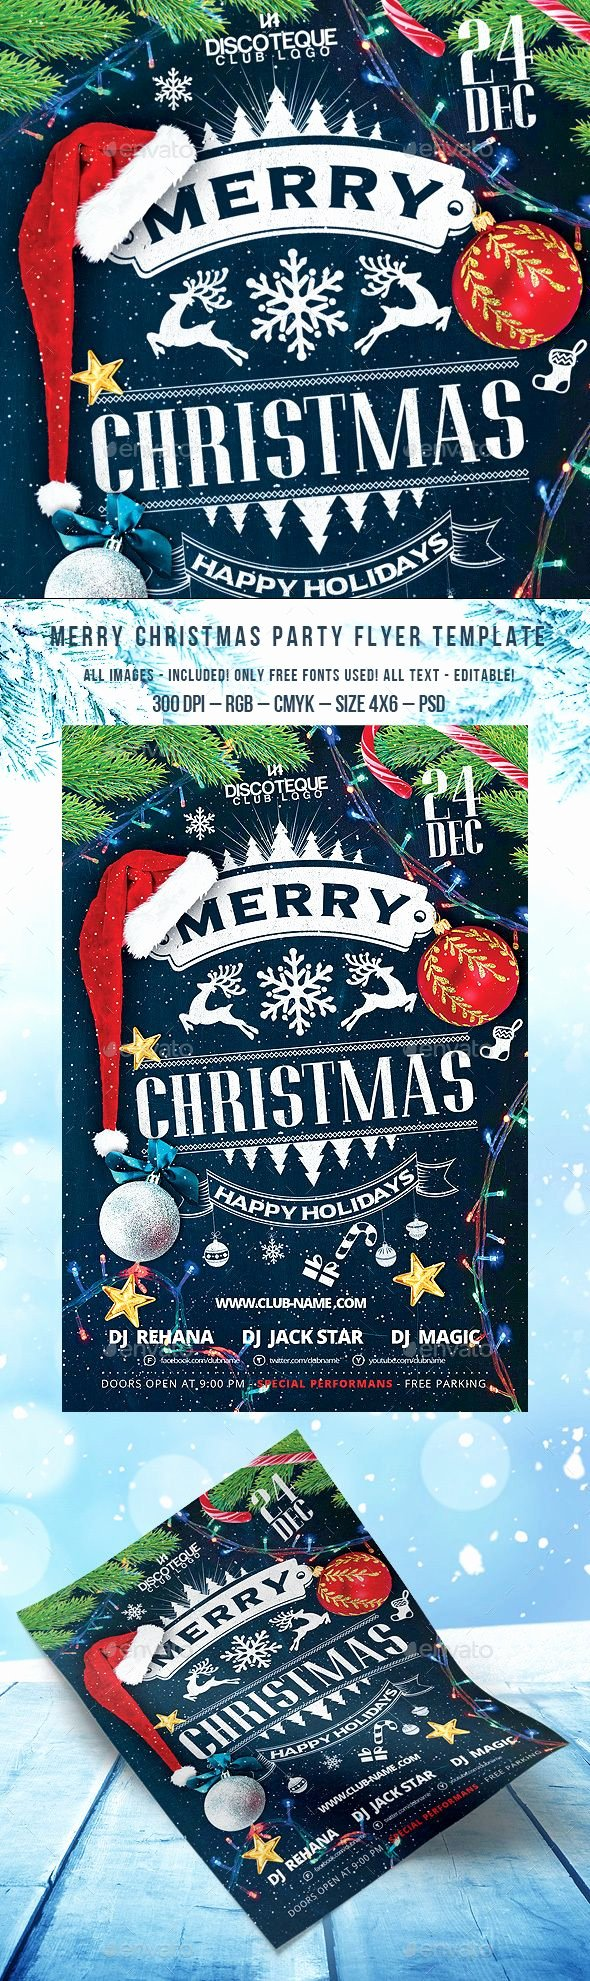 Party Poster Ideas New 25 Beautiful Christmas Flyer Ideas On Pinterest